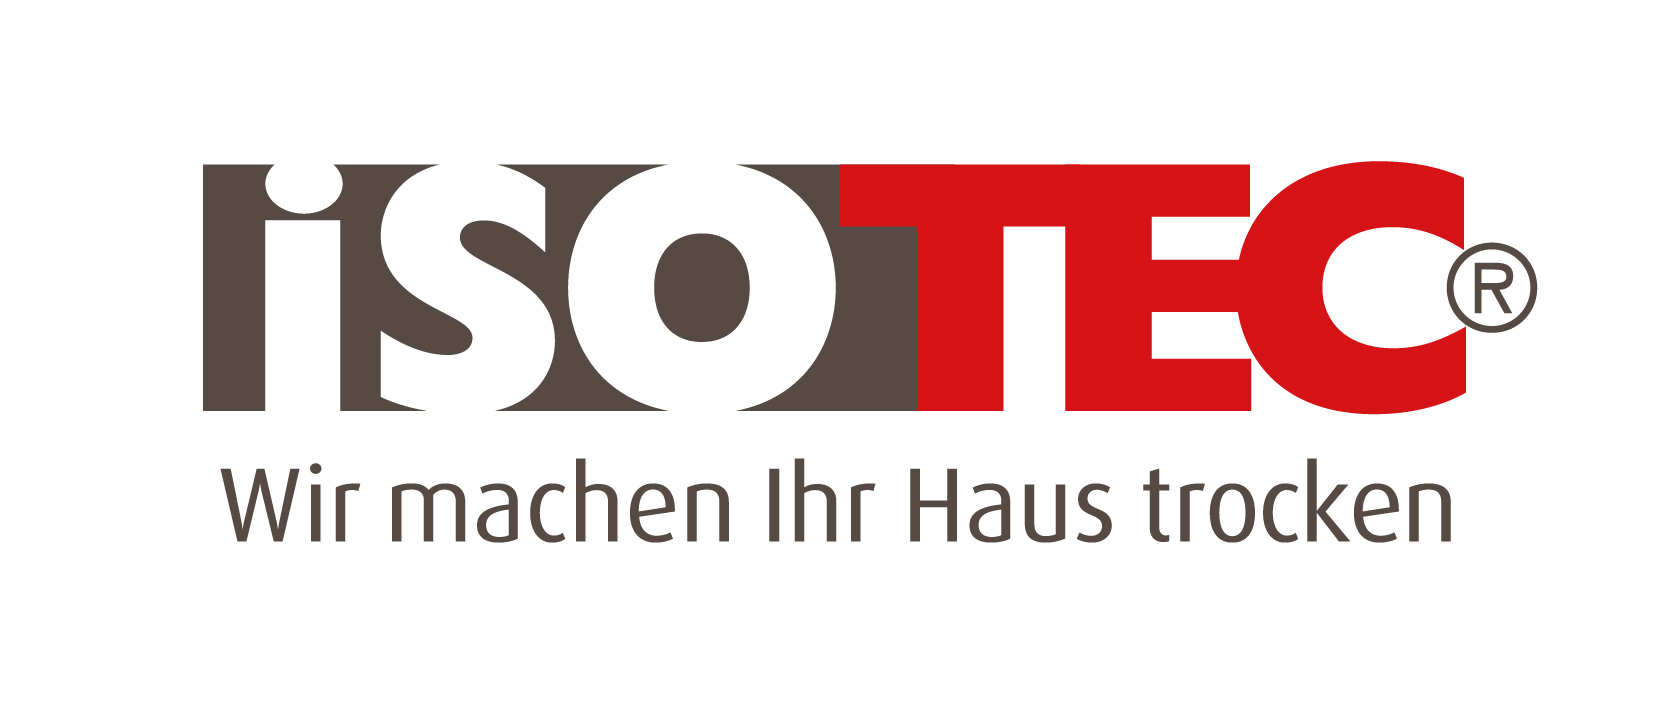 ISOTEC-Fachbetrieb Barowski-Böttcher GmbH